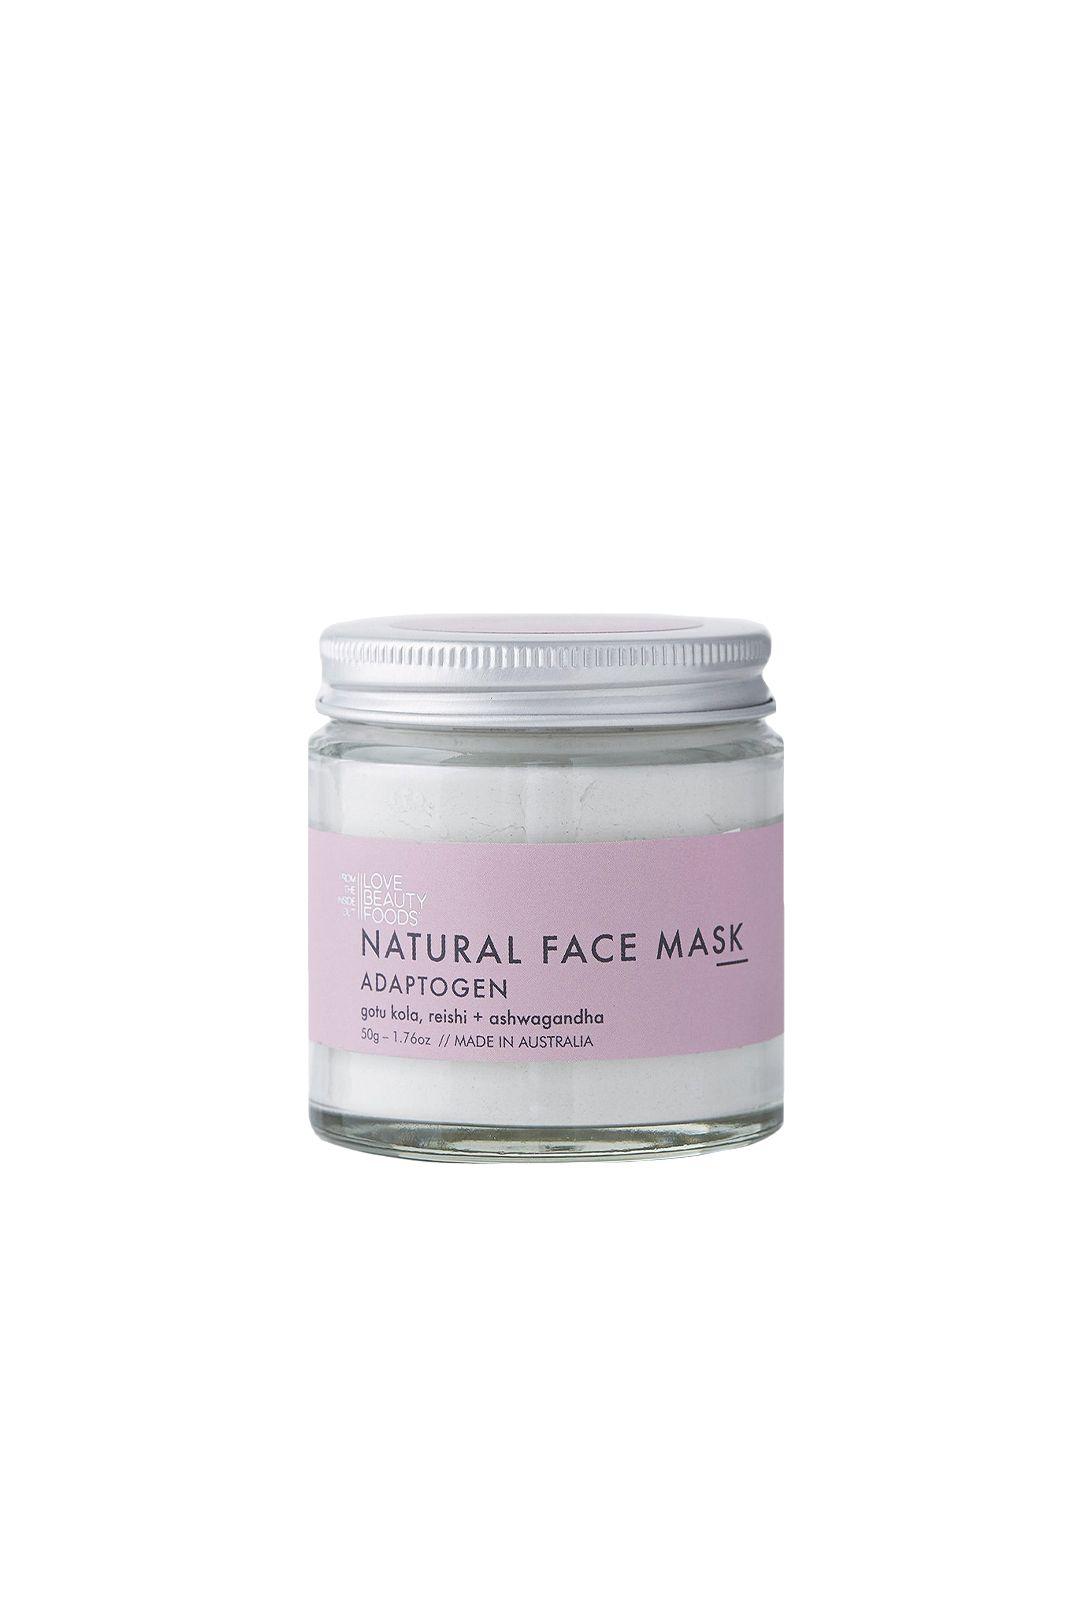 love-beauty-foods-natural-face-mask-adaptogen